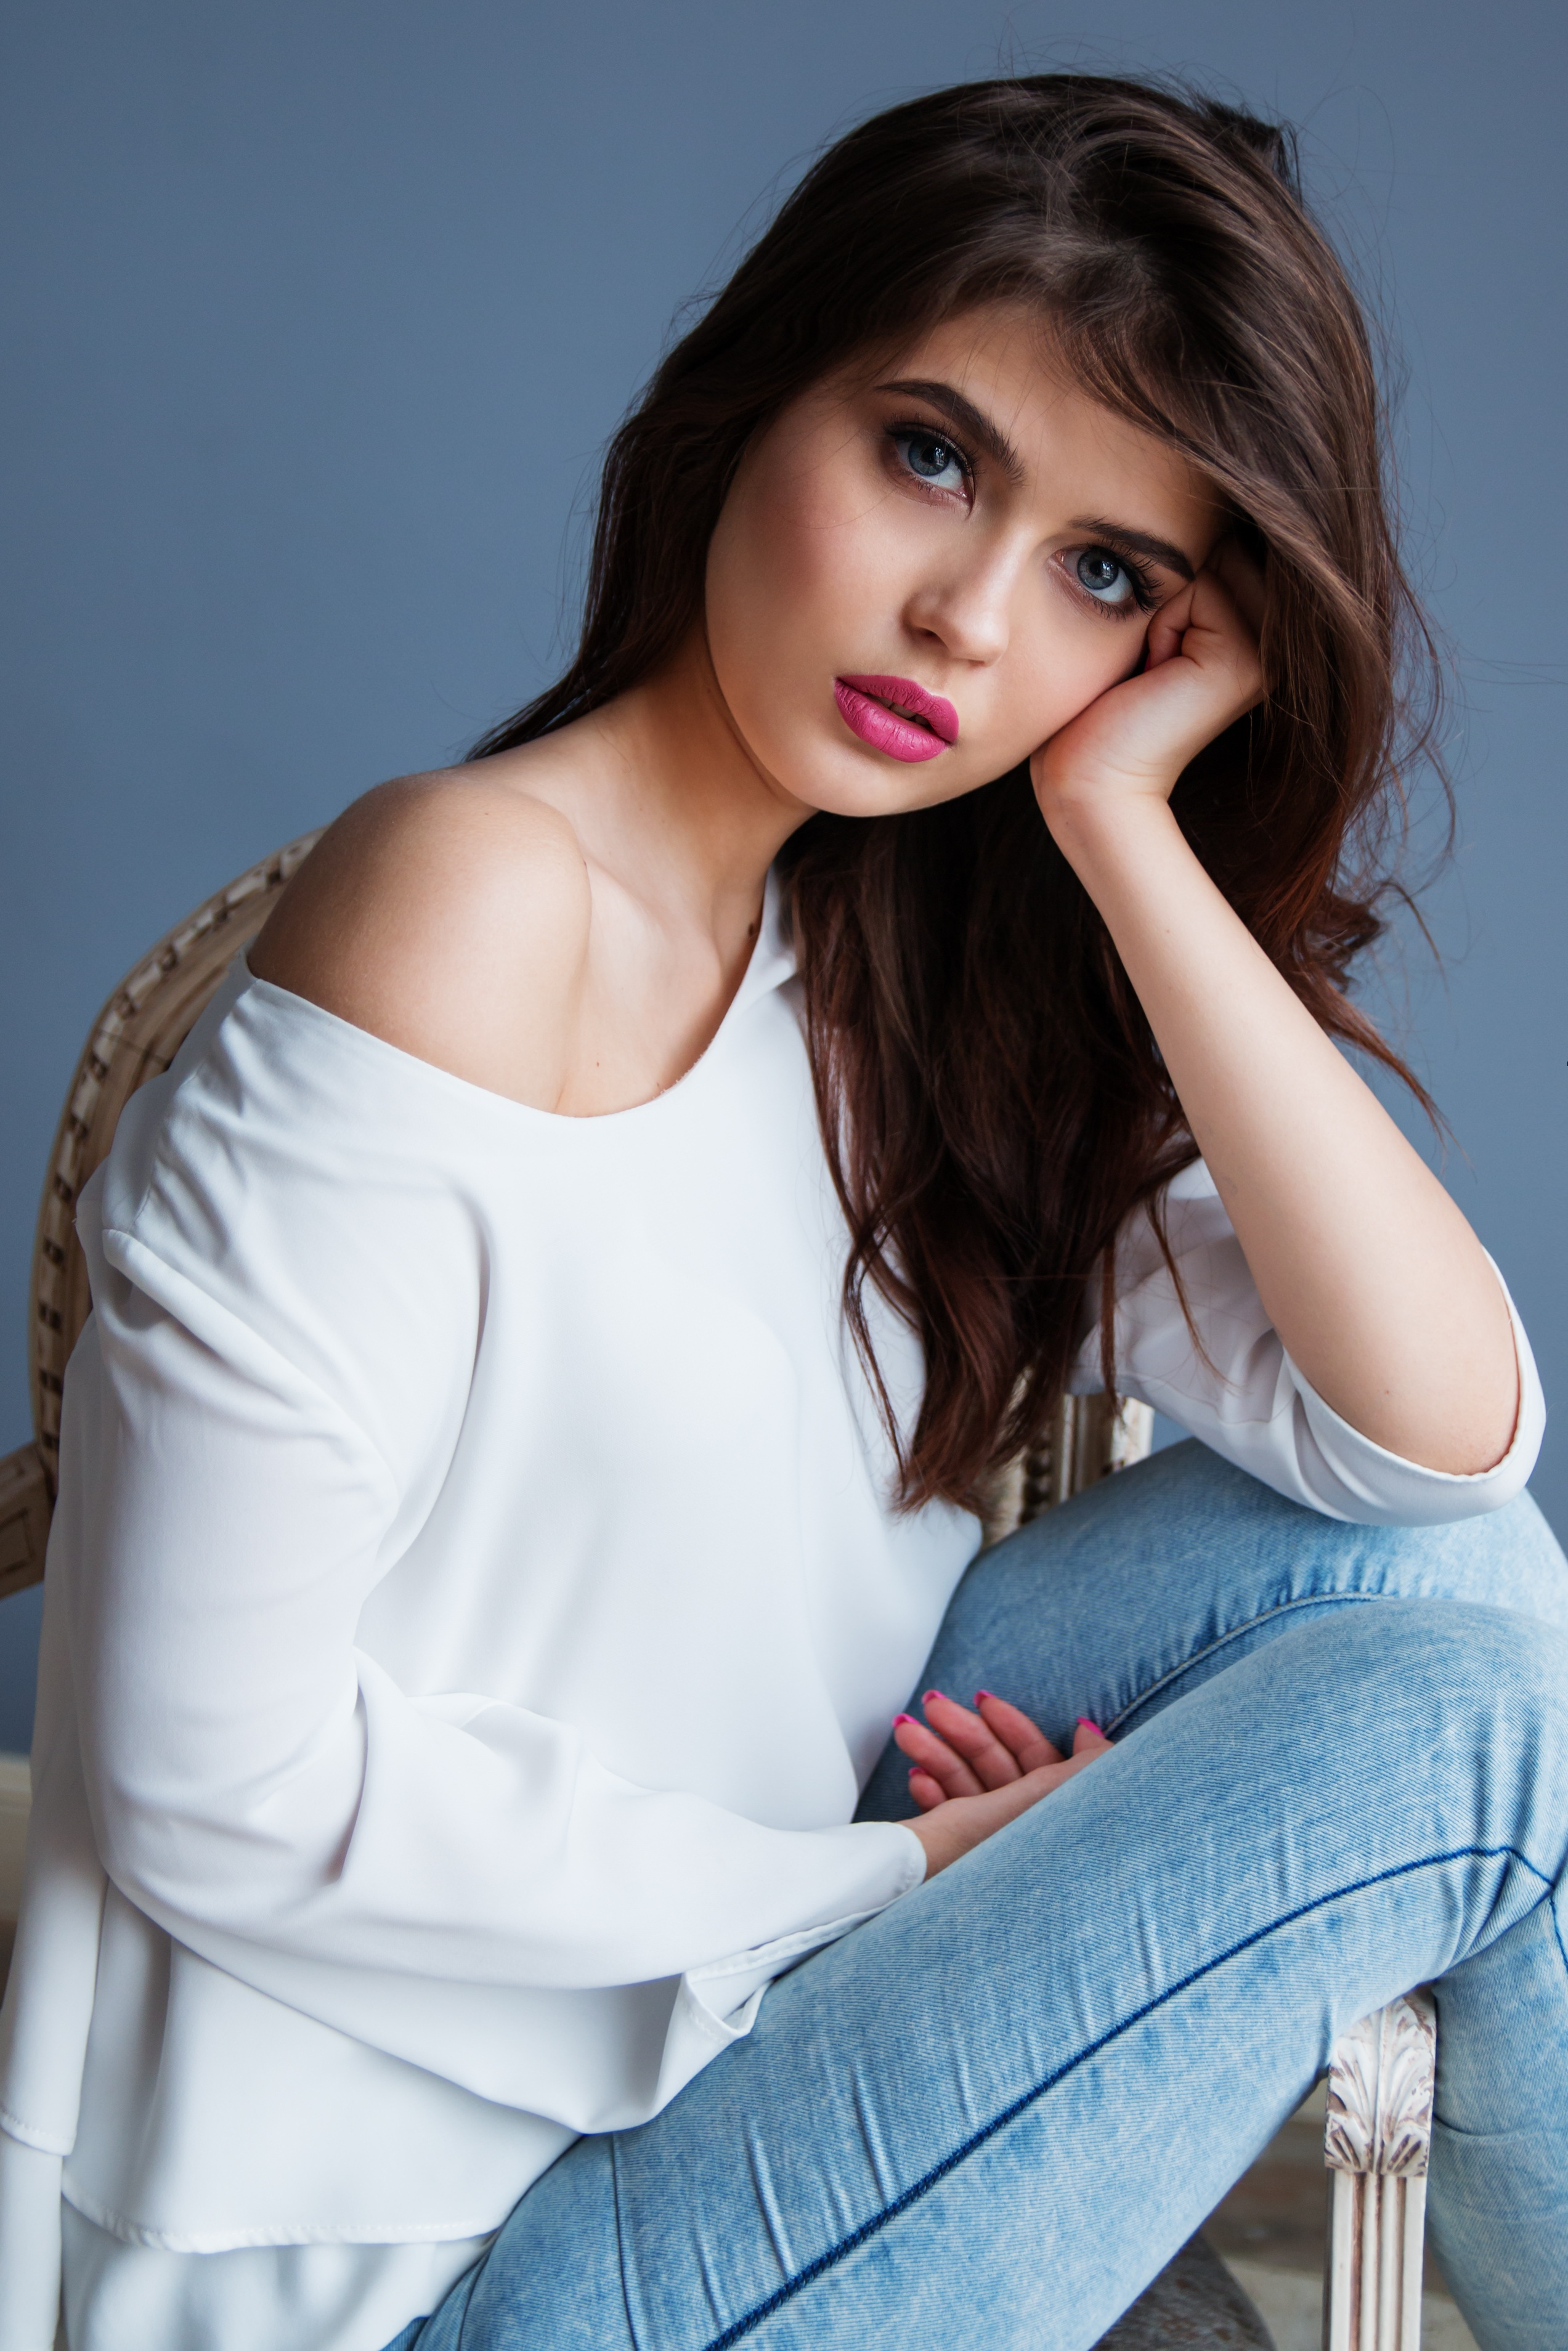 Model Girl, Activity, Beautiful, Fashion, Girl, HQ Photo